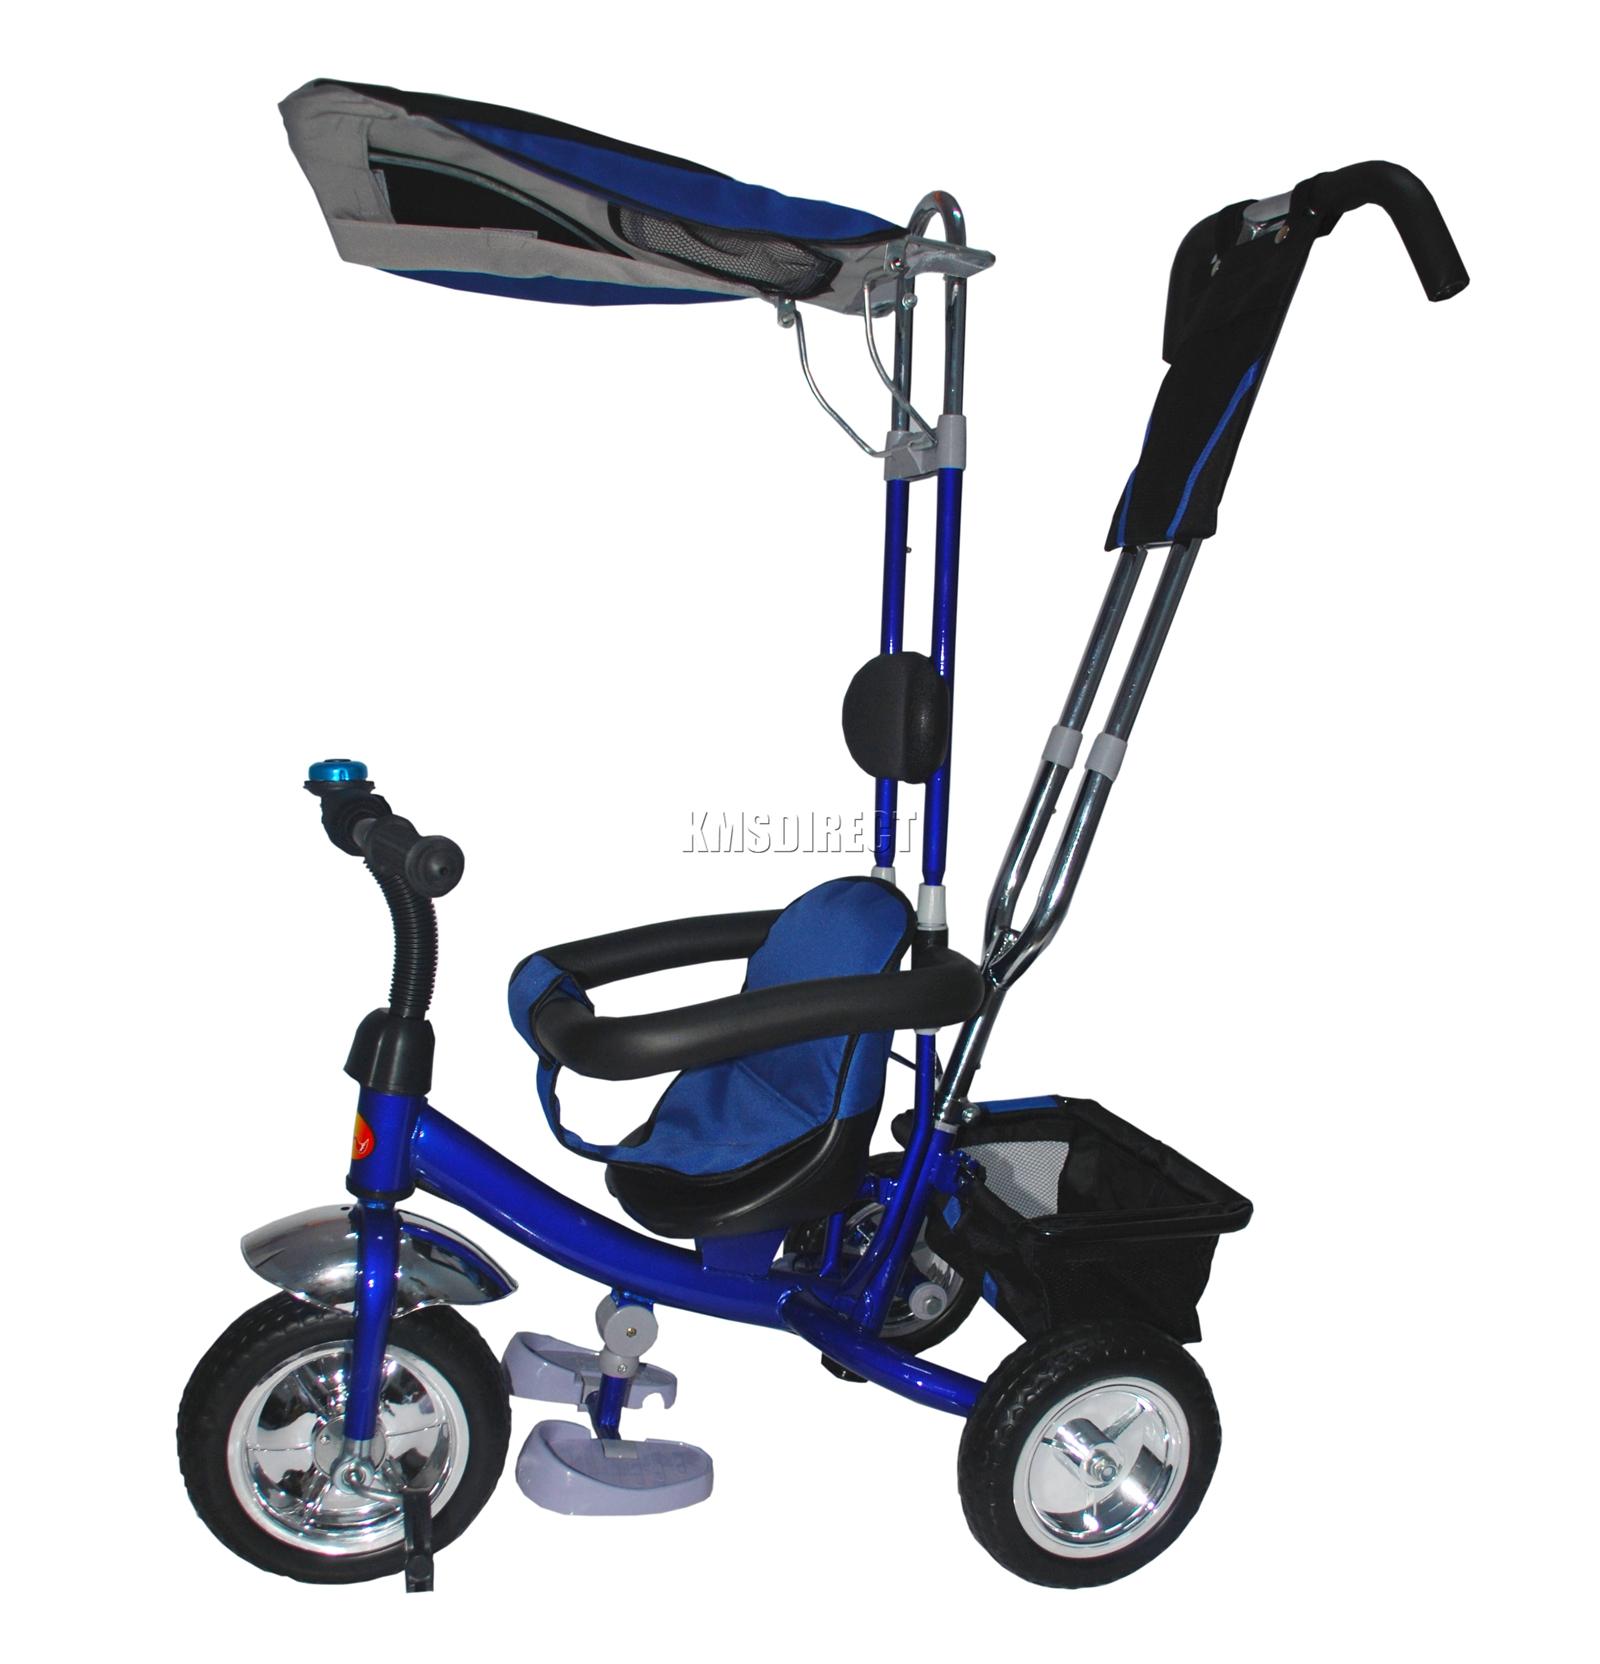 Foxhunter 4in1 Children Kids Trike Tricycle 3 Wheel Ride